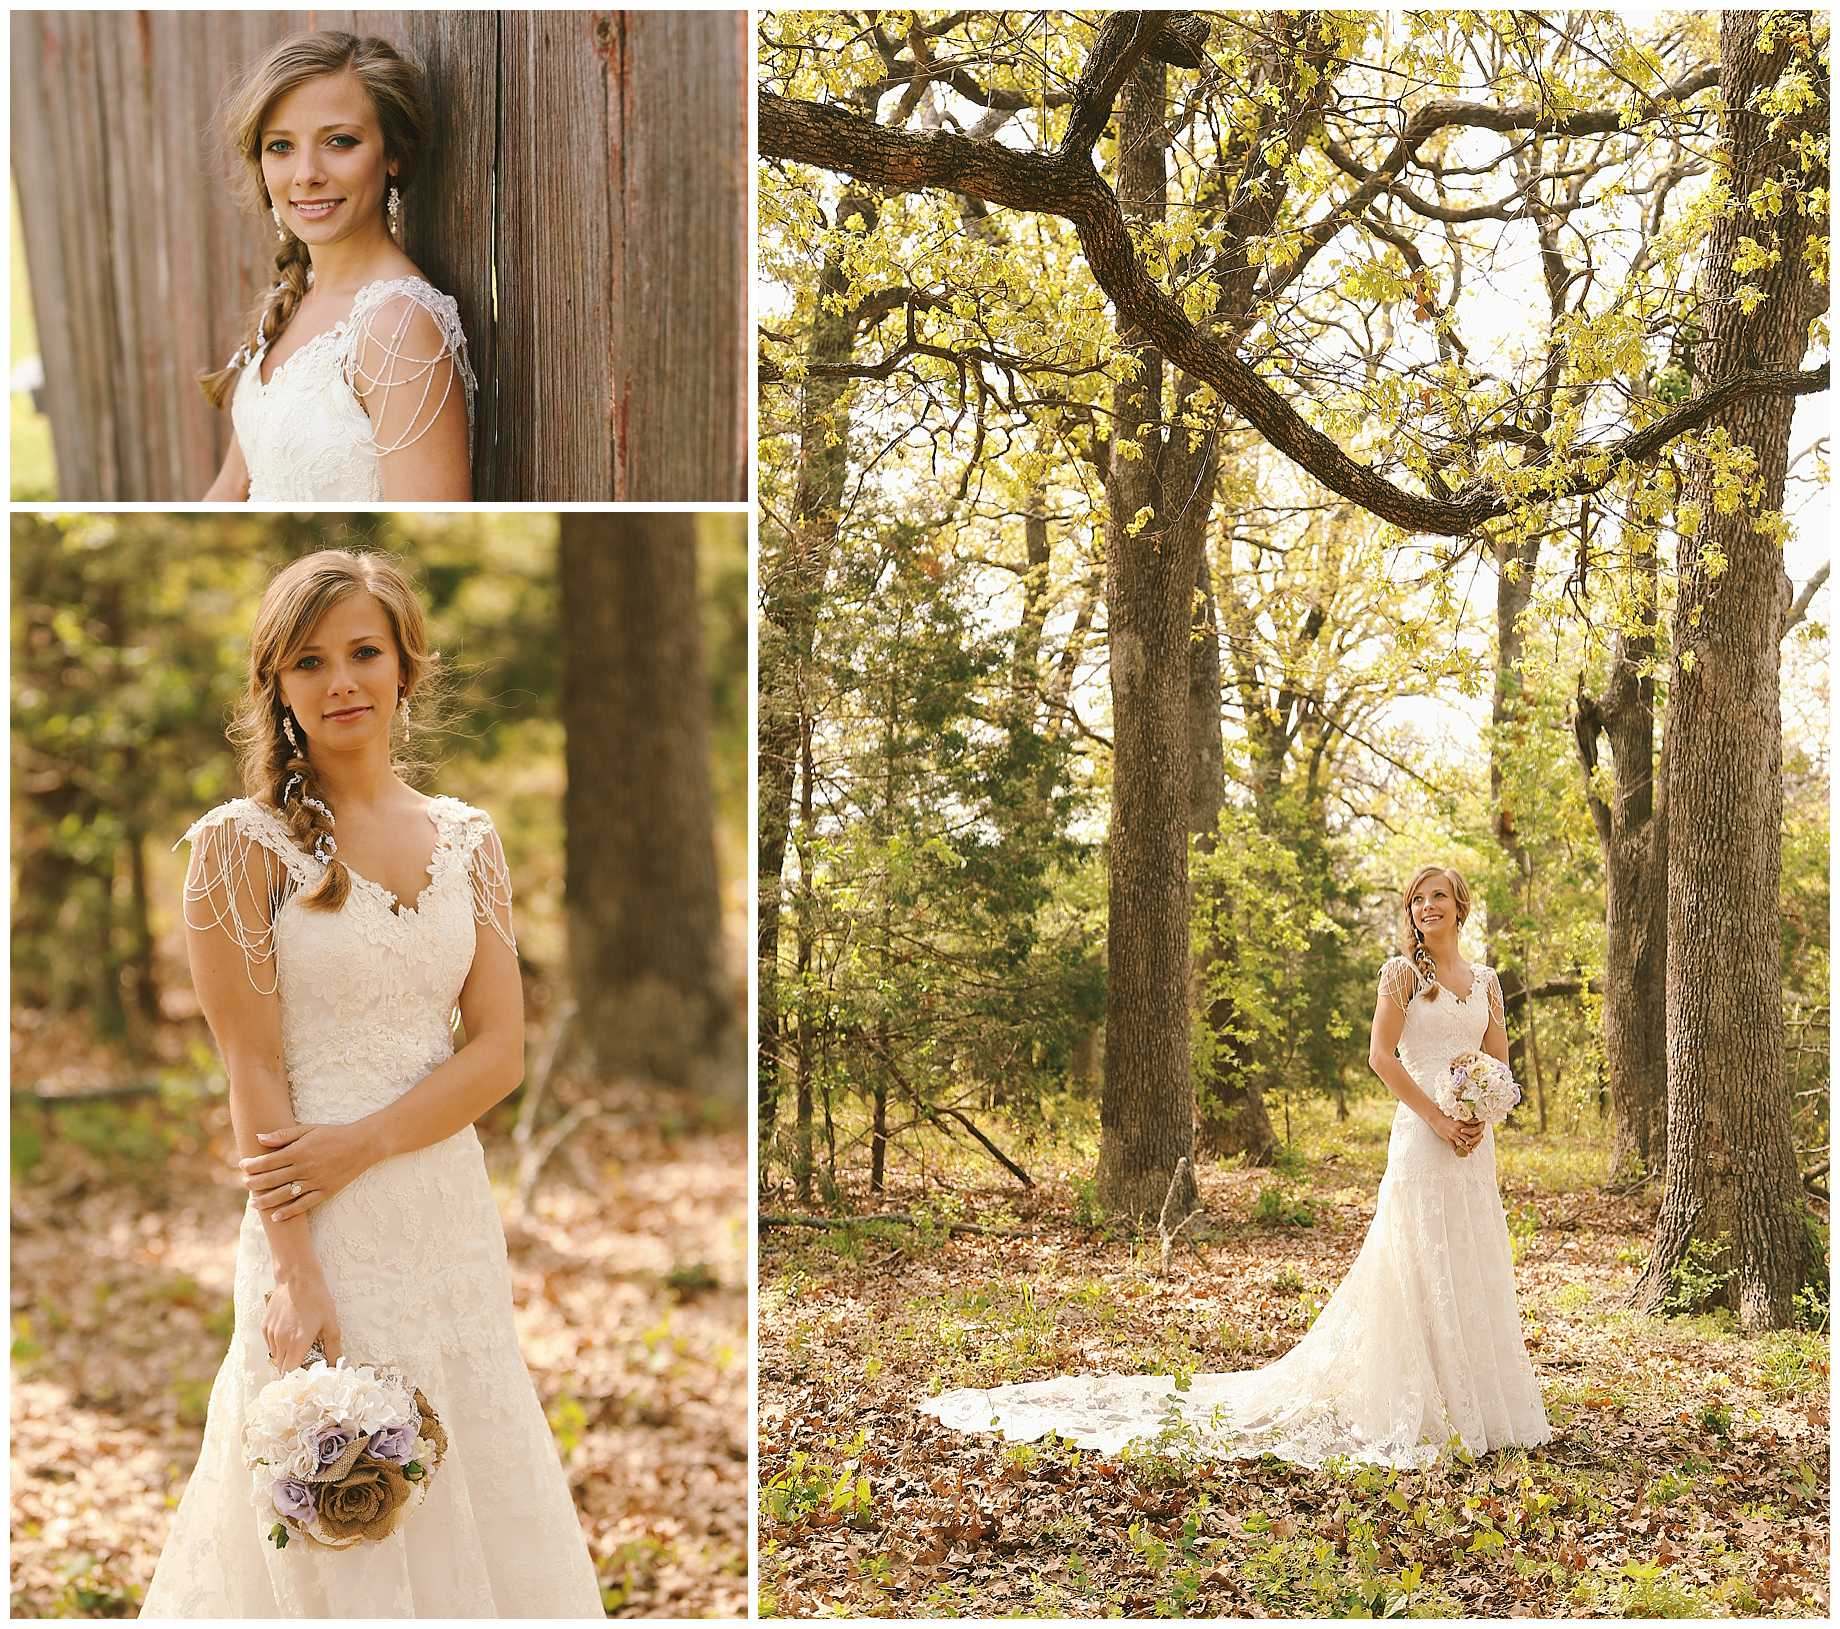 bride-on-a-horse-east-texas-01